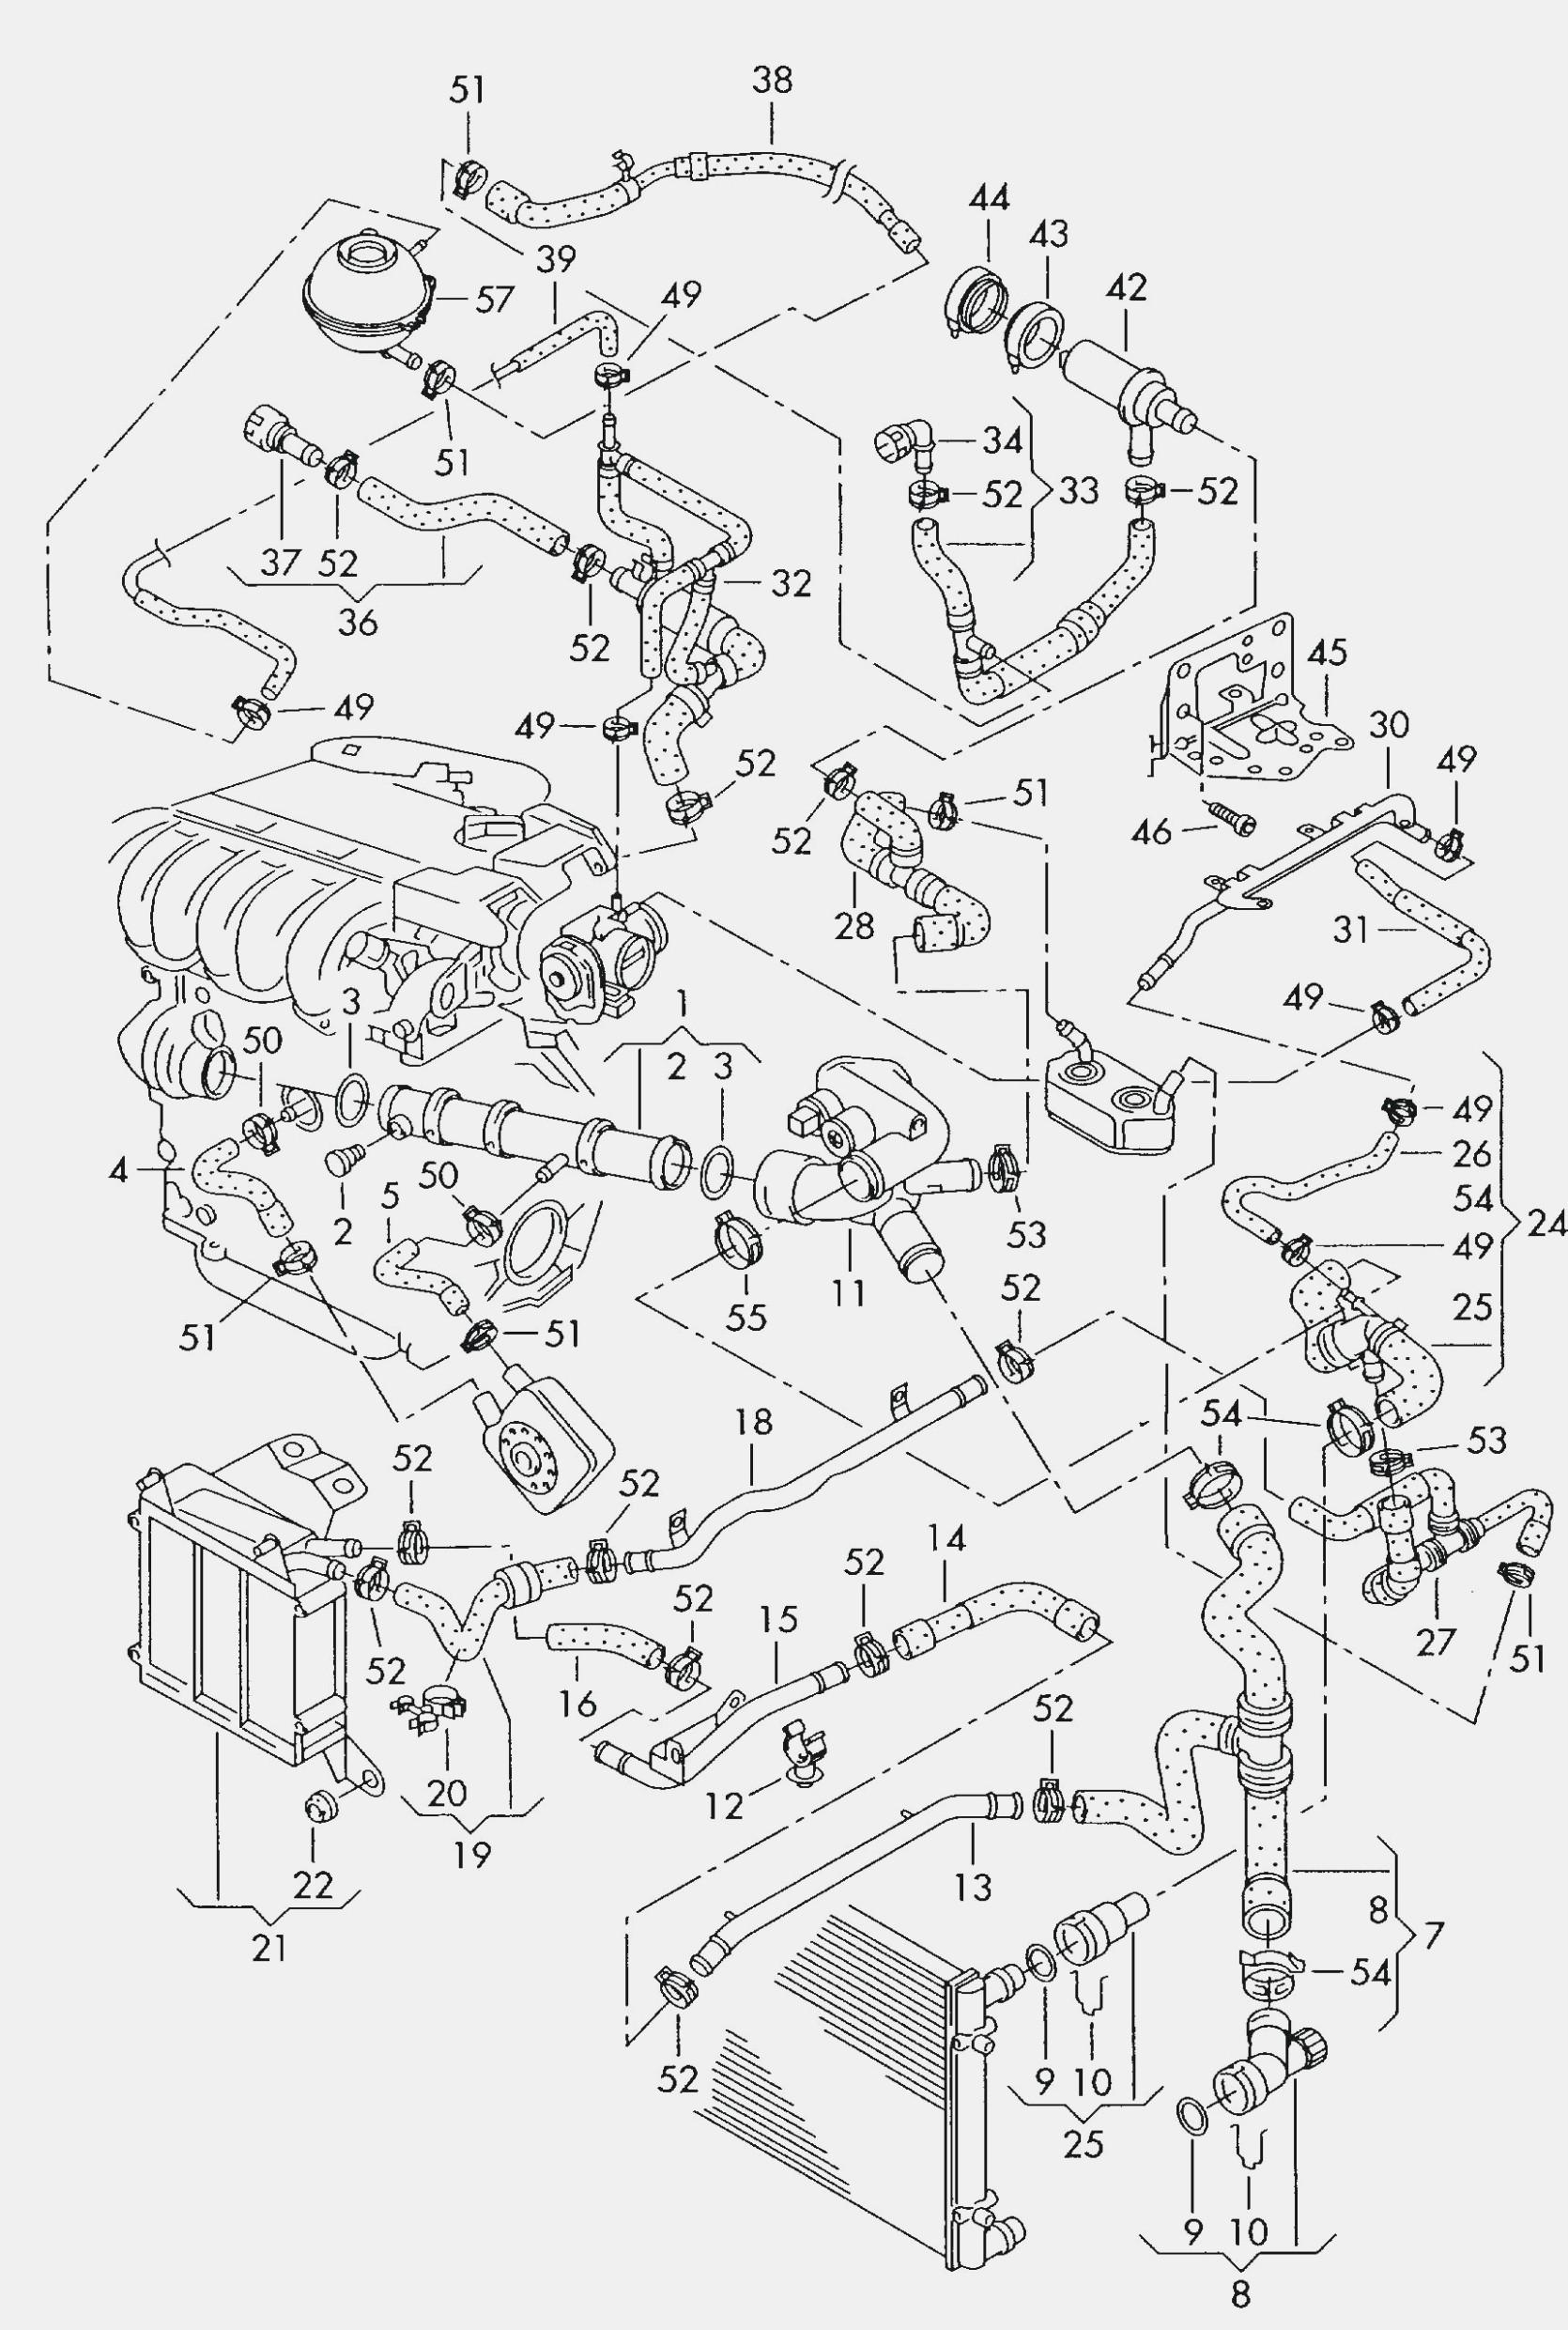 Chevy 3 1 Engine Diagram 2 Wrg 7916] 2 2 Engine Diagram Of Chevy 3 1 Engine Diagram 2